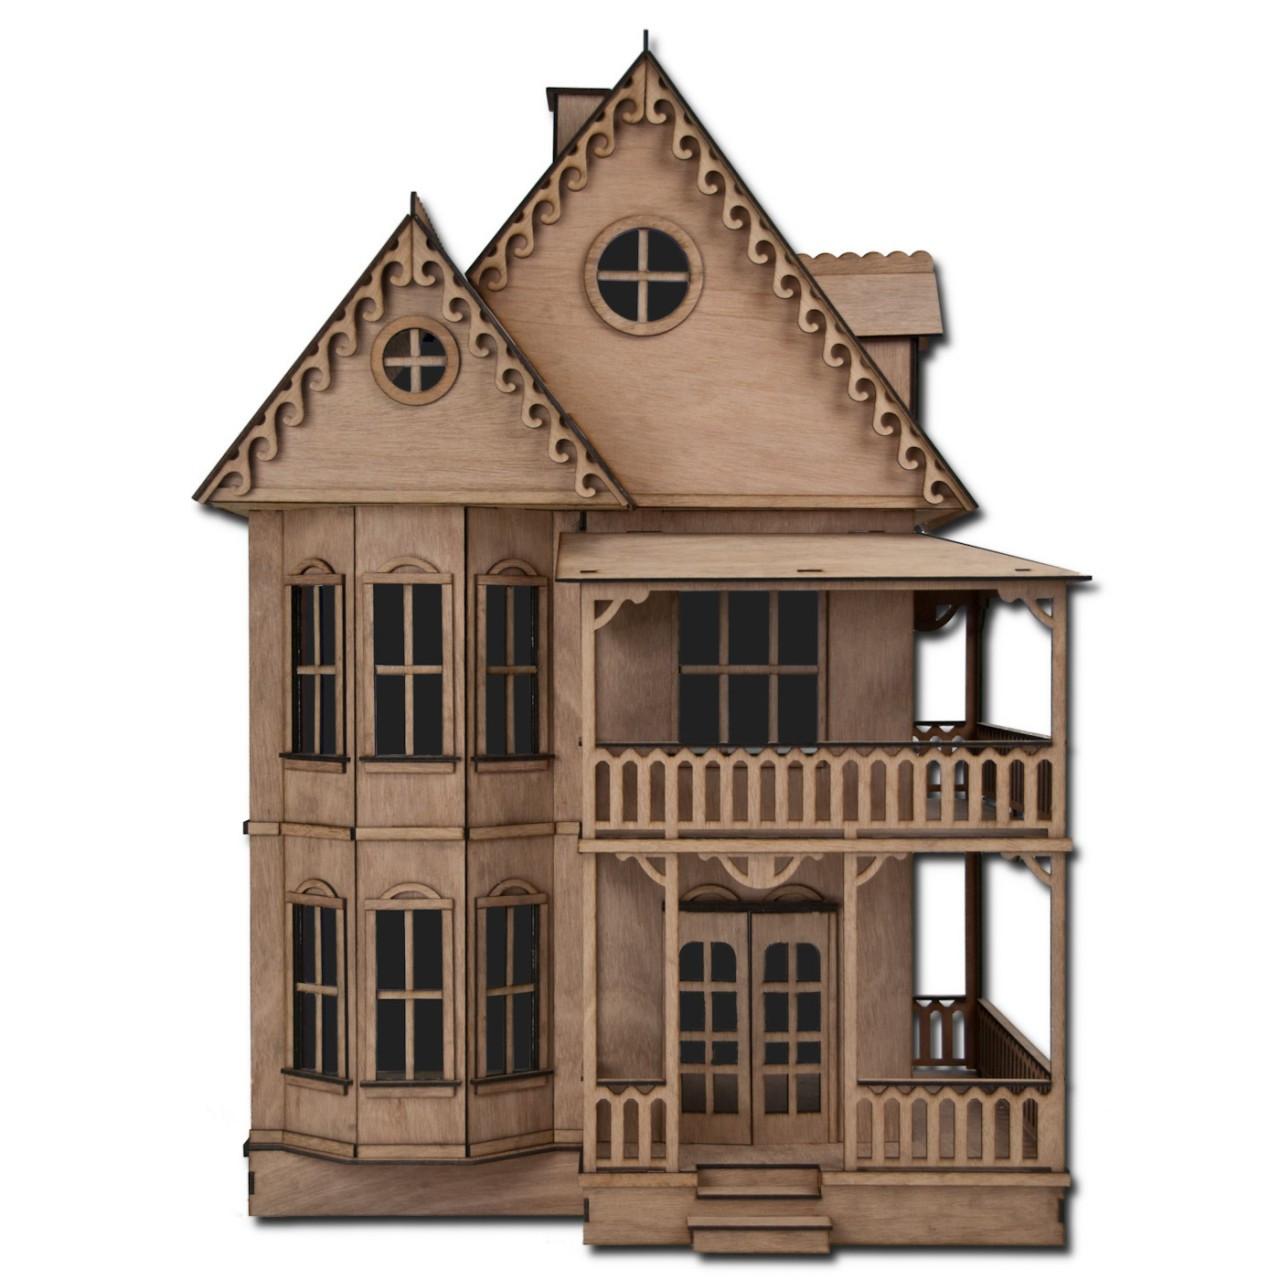 Tennyson Dollhouse Kit